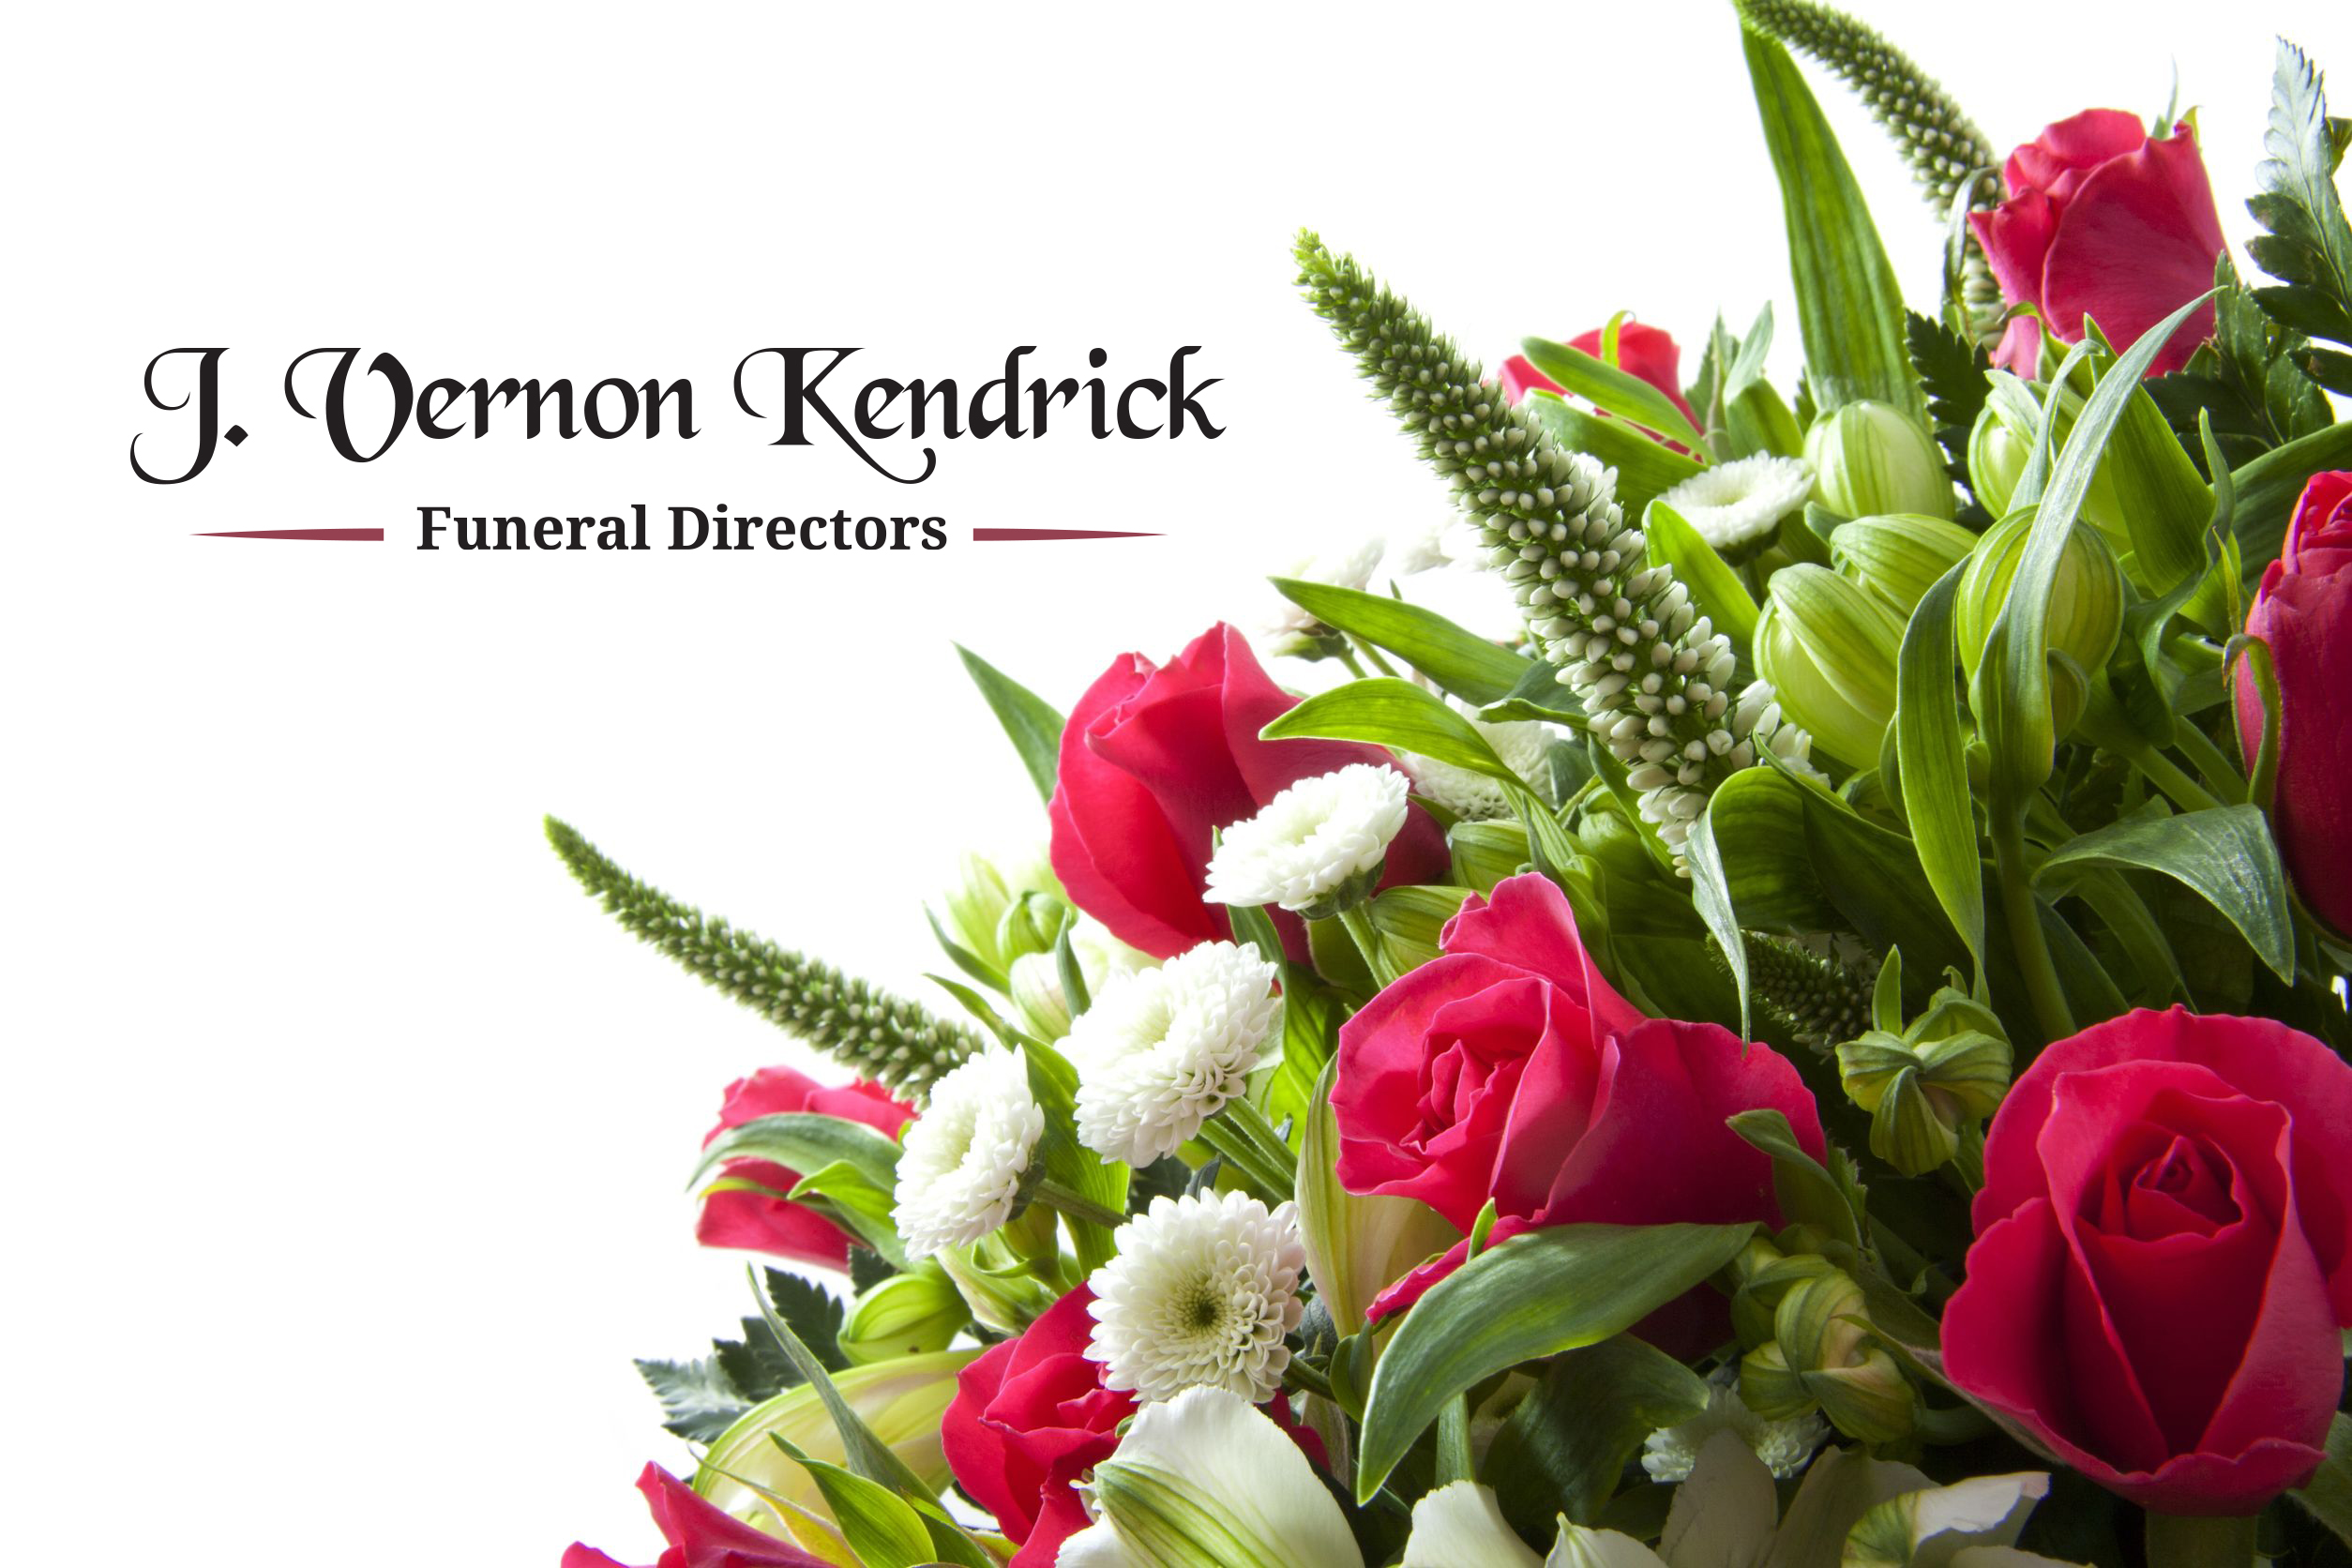 J Vernon Kendrick and Farmer & Son Funeral Directors